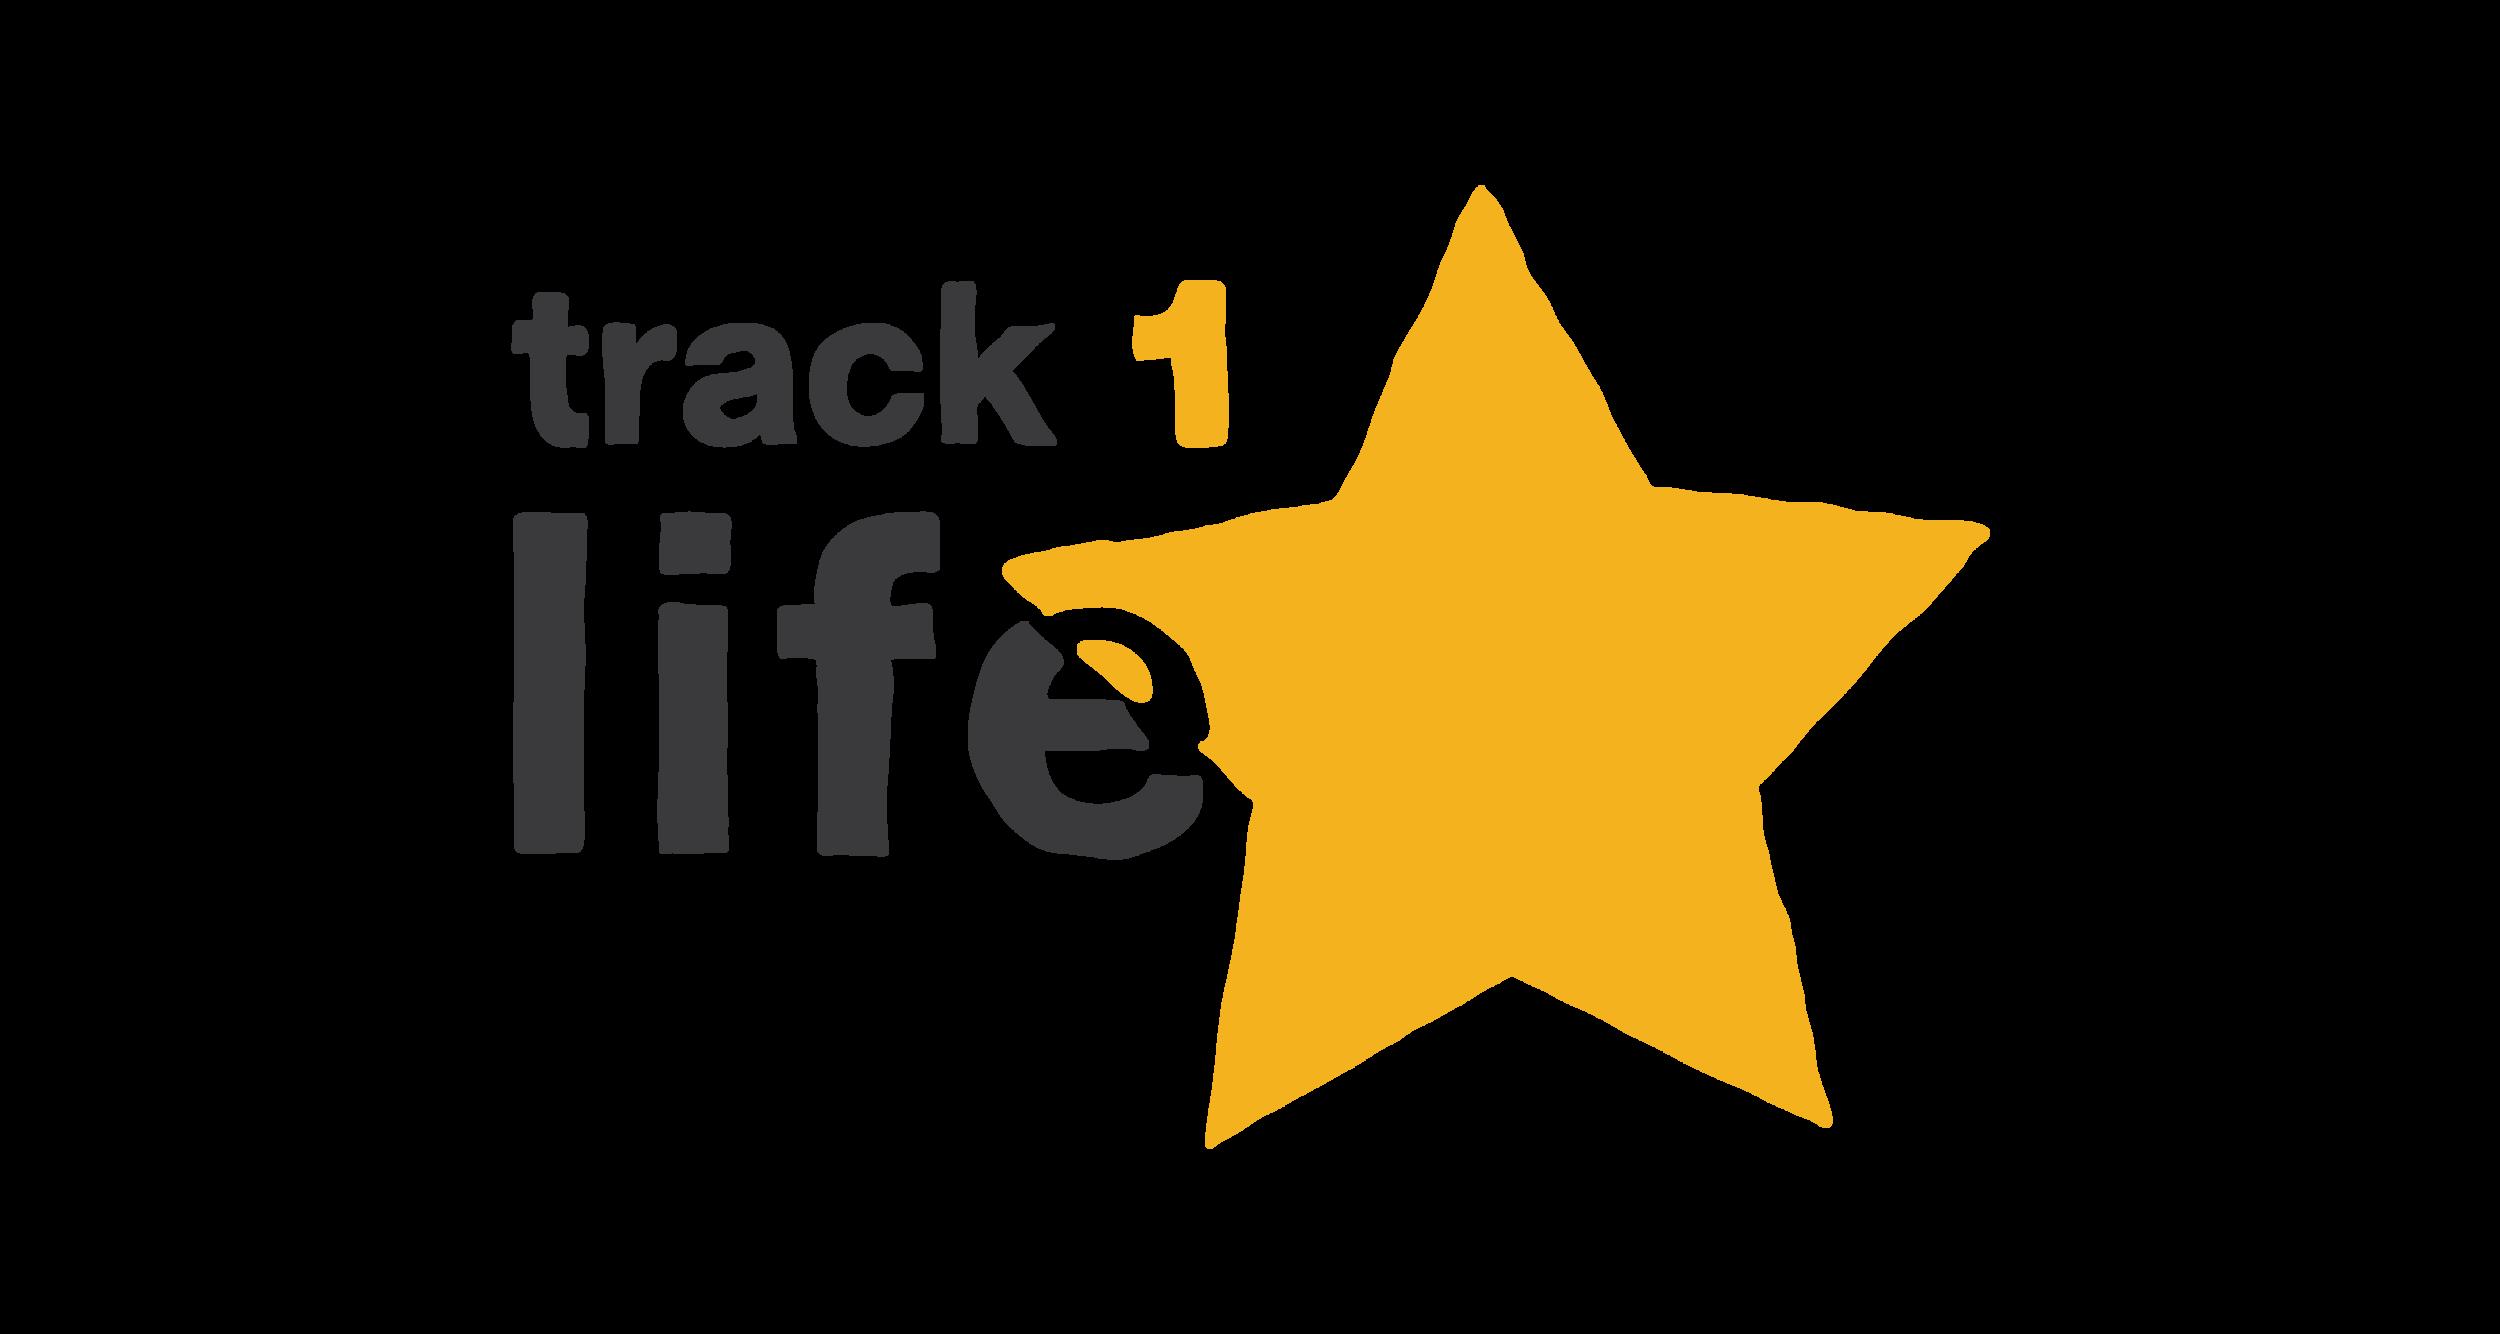 tracks symbols-06.png